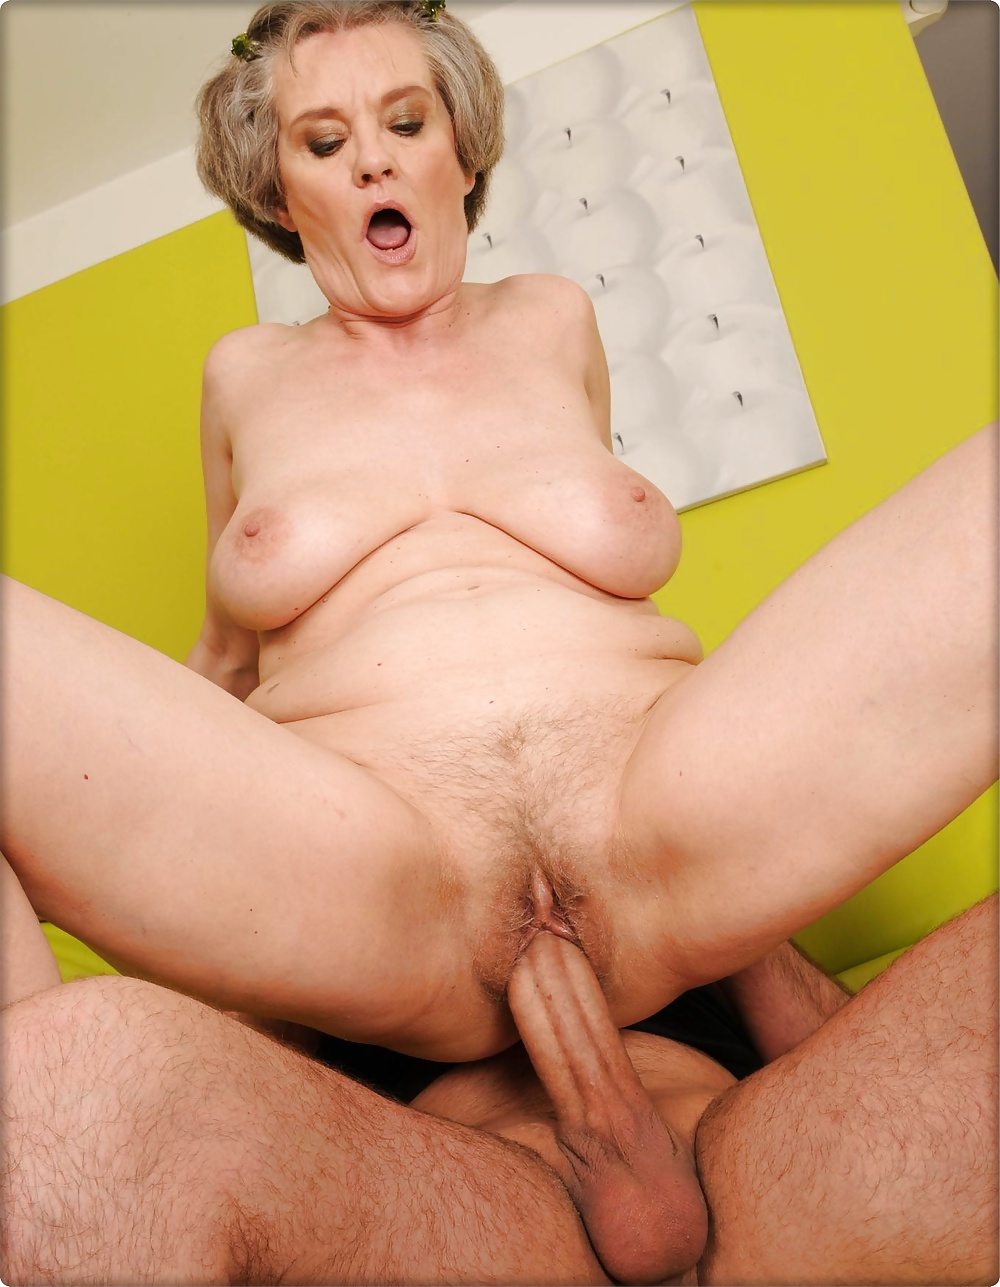 Hot Sexy Porn Actress Porn Pics, Sex Photos, Xxx Images